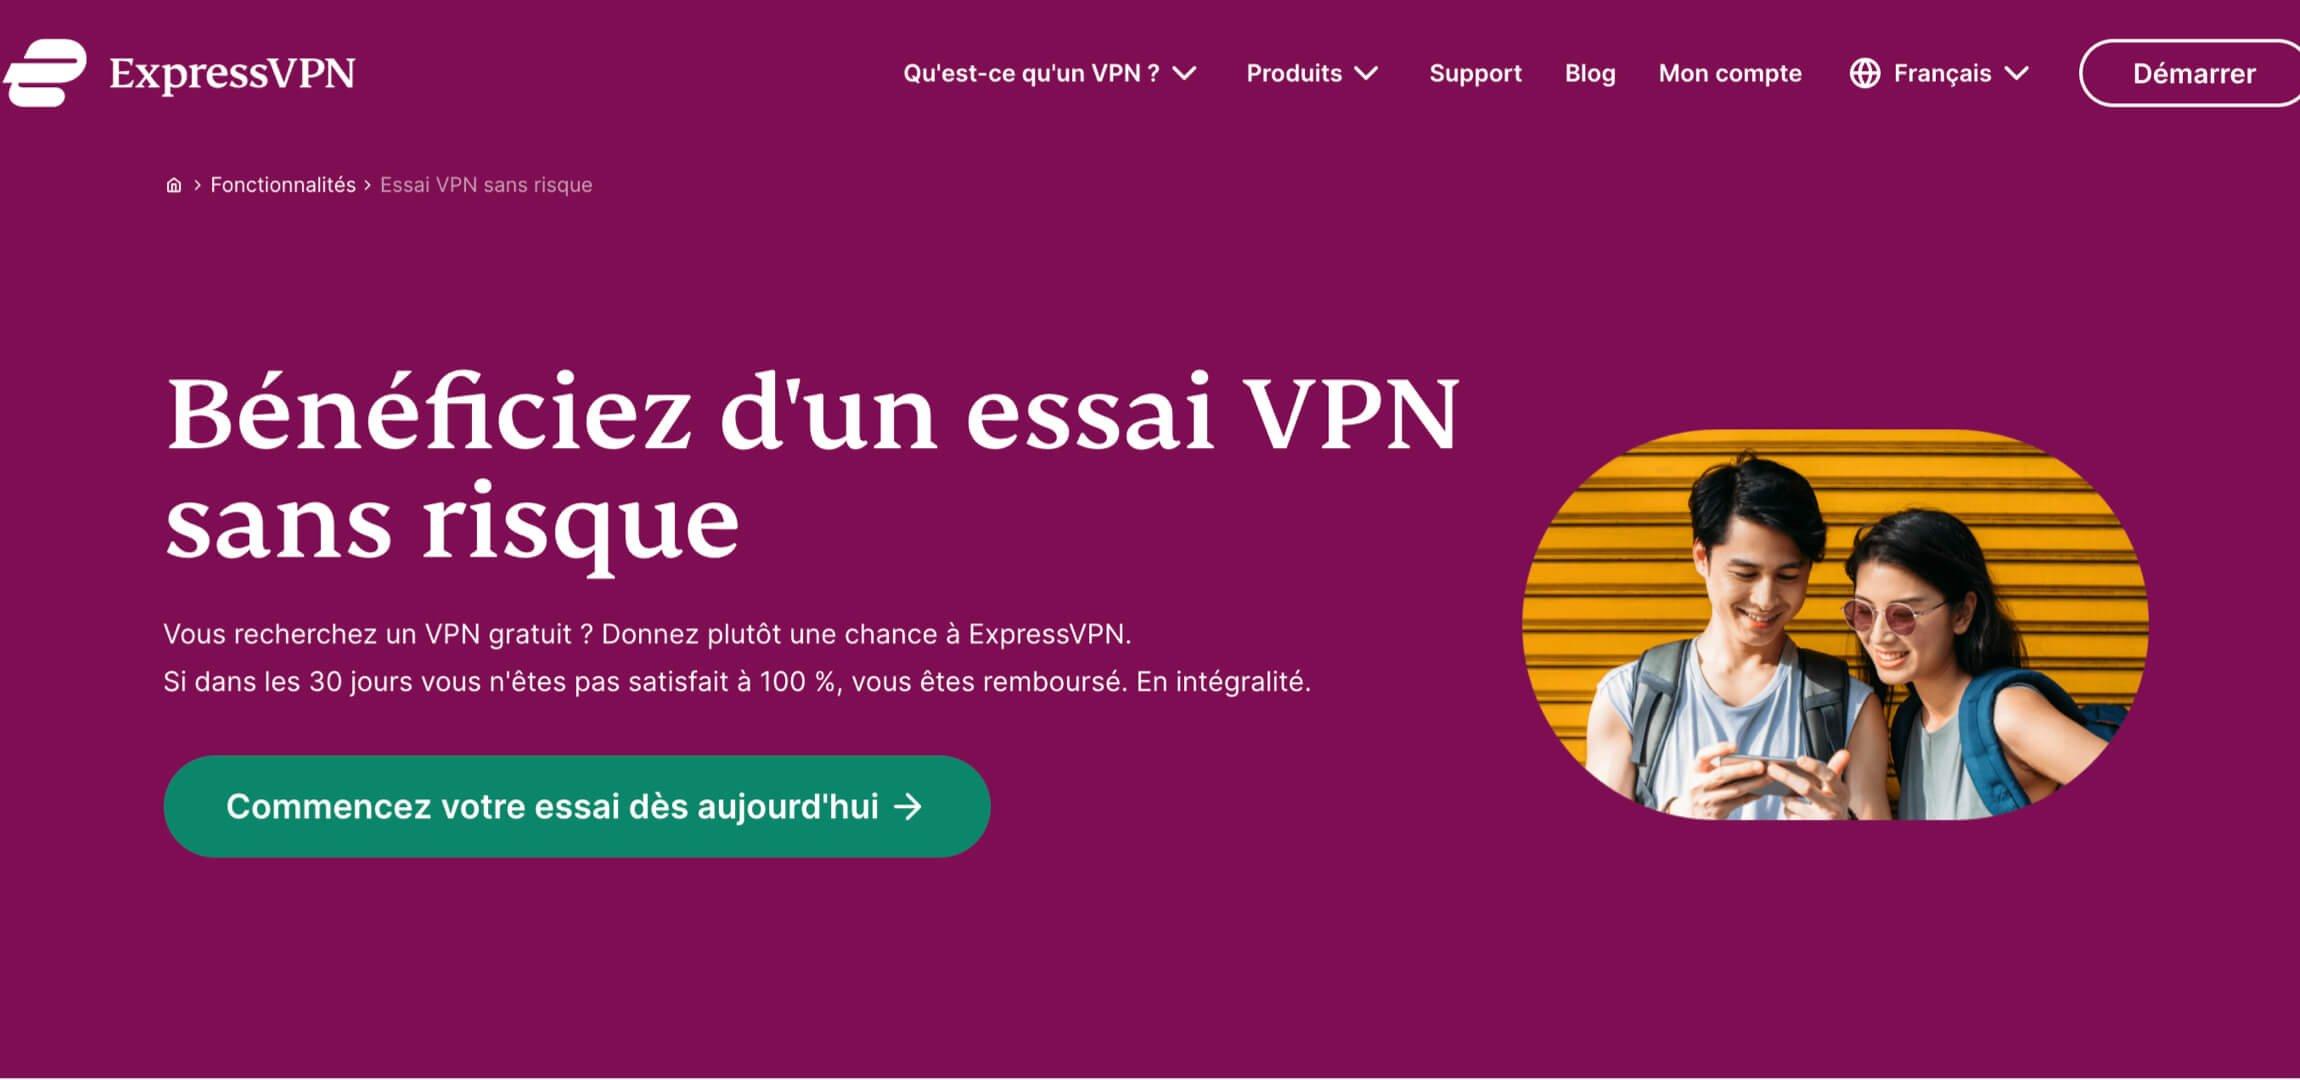 expressVPN gratuit